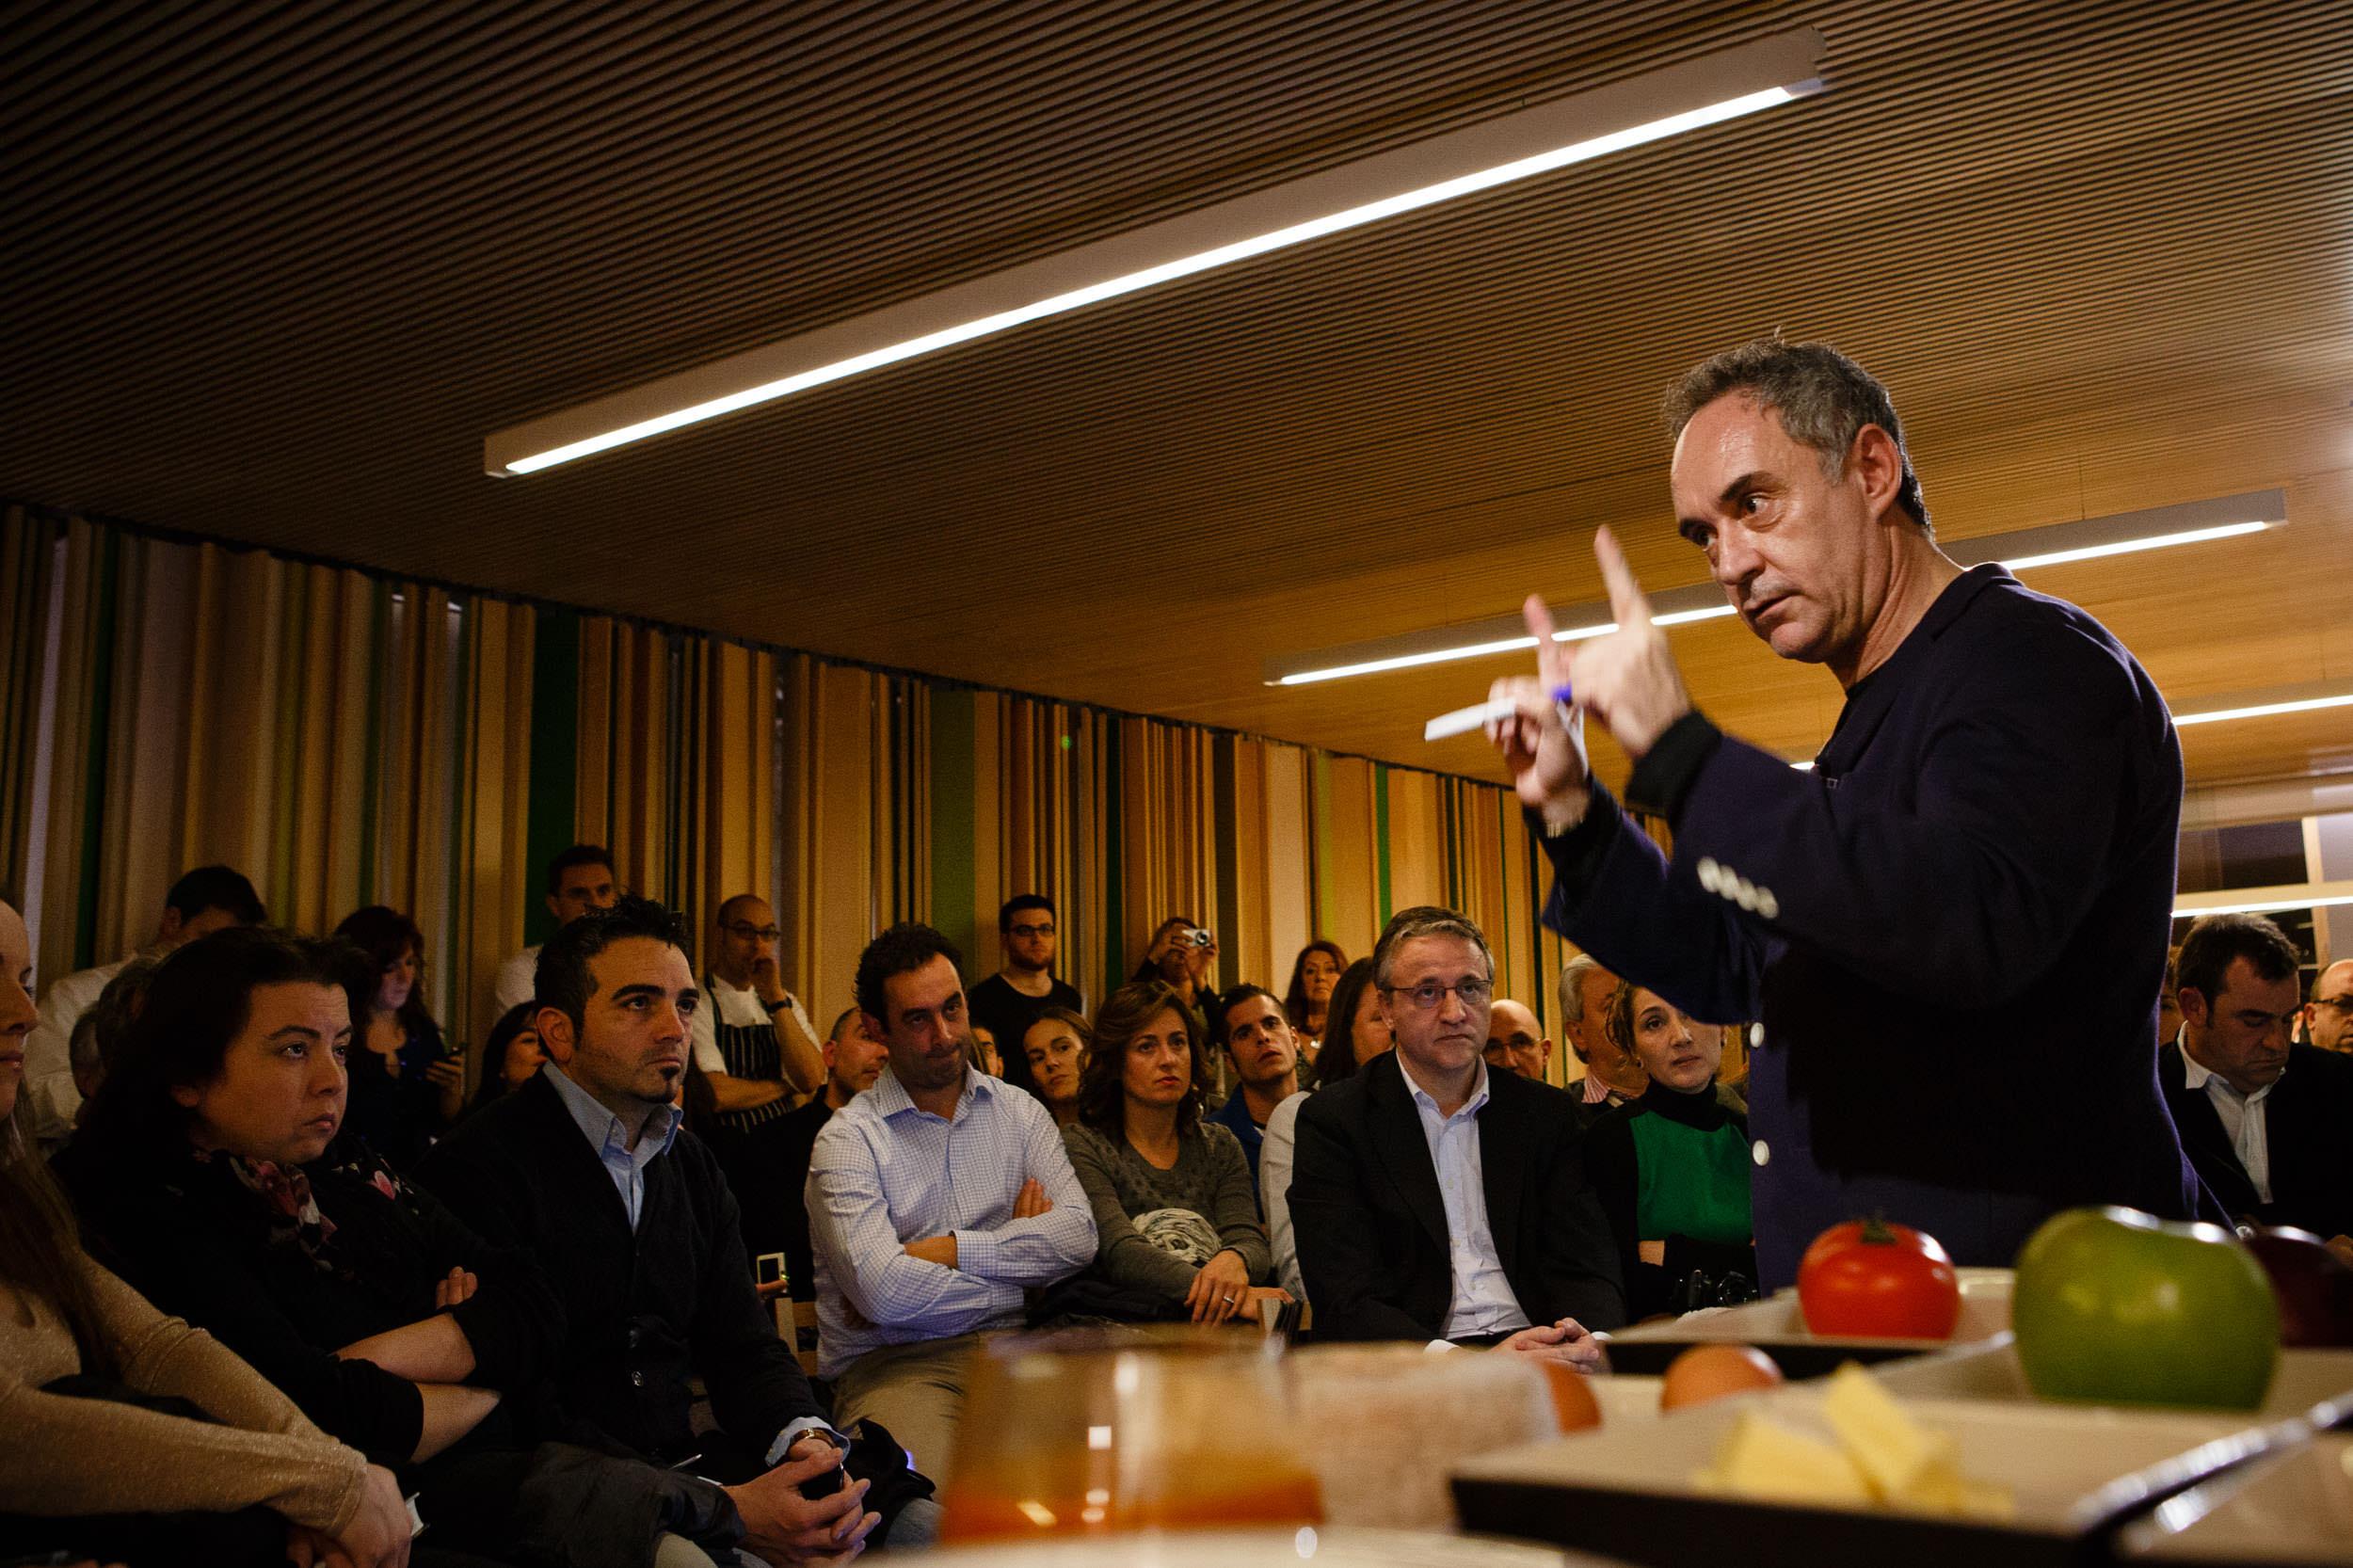 Fotoperiodismo Fotografia Editorial La Rioja País Vasco España - James Sturcke - sturcke.org_026.jpg